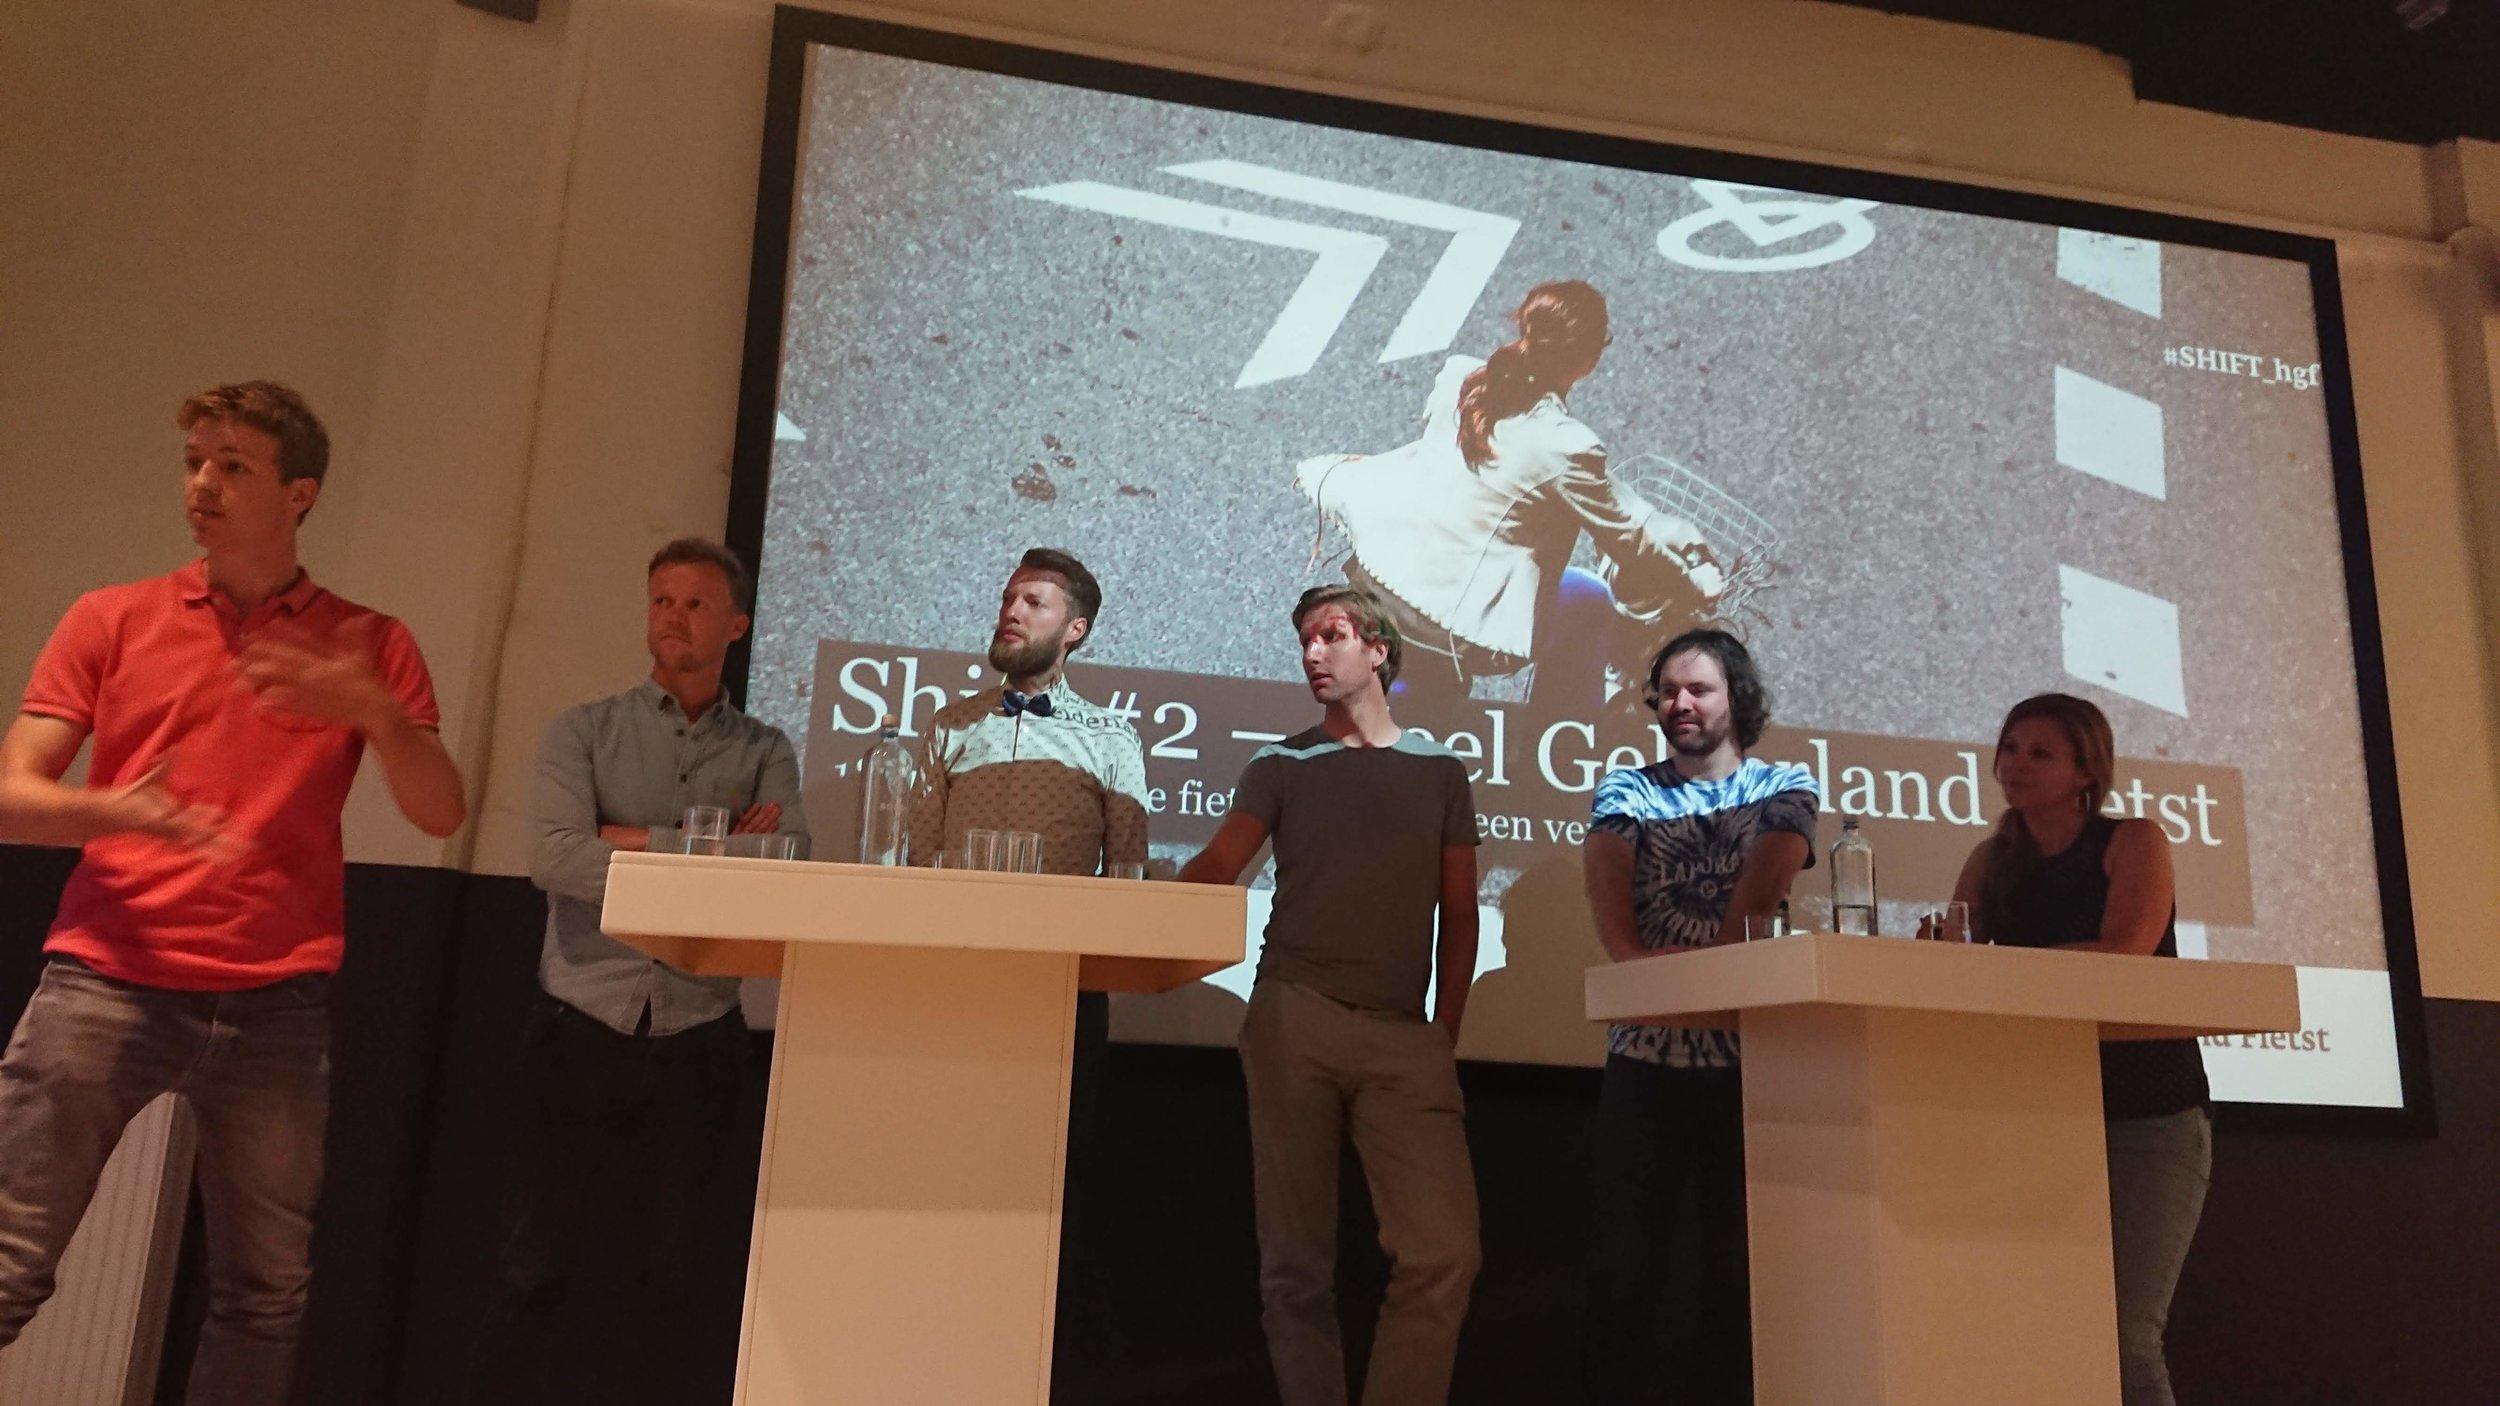 V.l.n.r. Jilt van Schayik (Biky), Teun Meulepas (Biky), Bram Witvliet (Bram Fietst), Marco te Brömmelstroet (UvA), Pepijn (Hét Bakkerscafé), Eva Walraven (Hét Bakkerscafé)